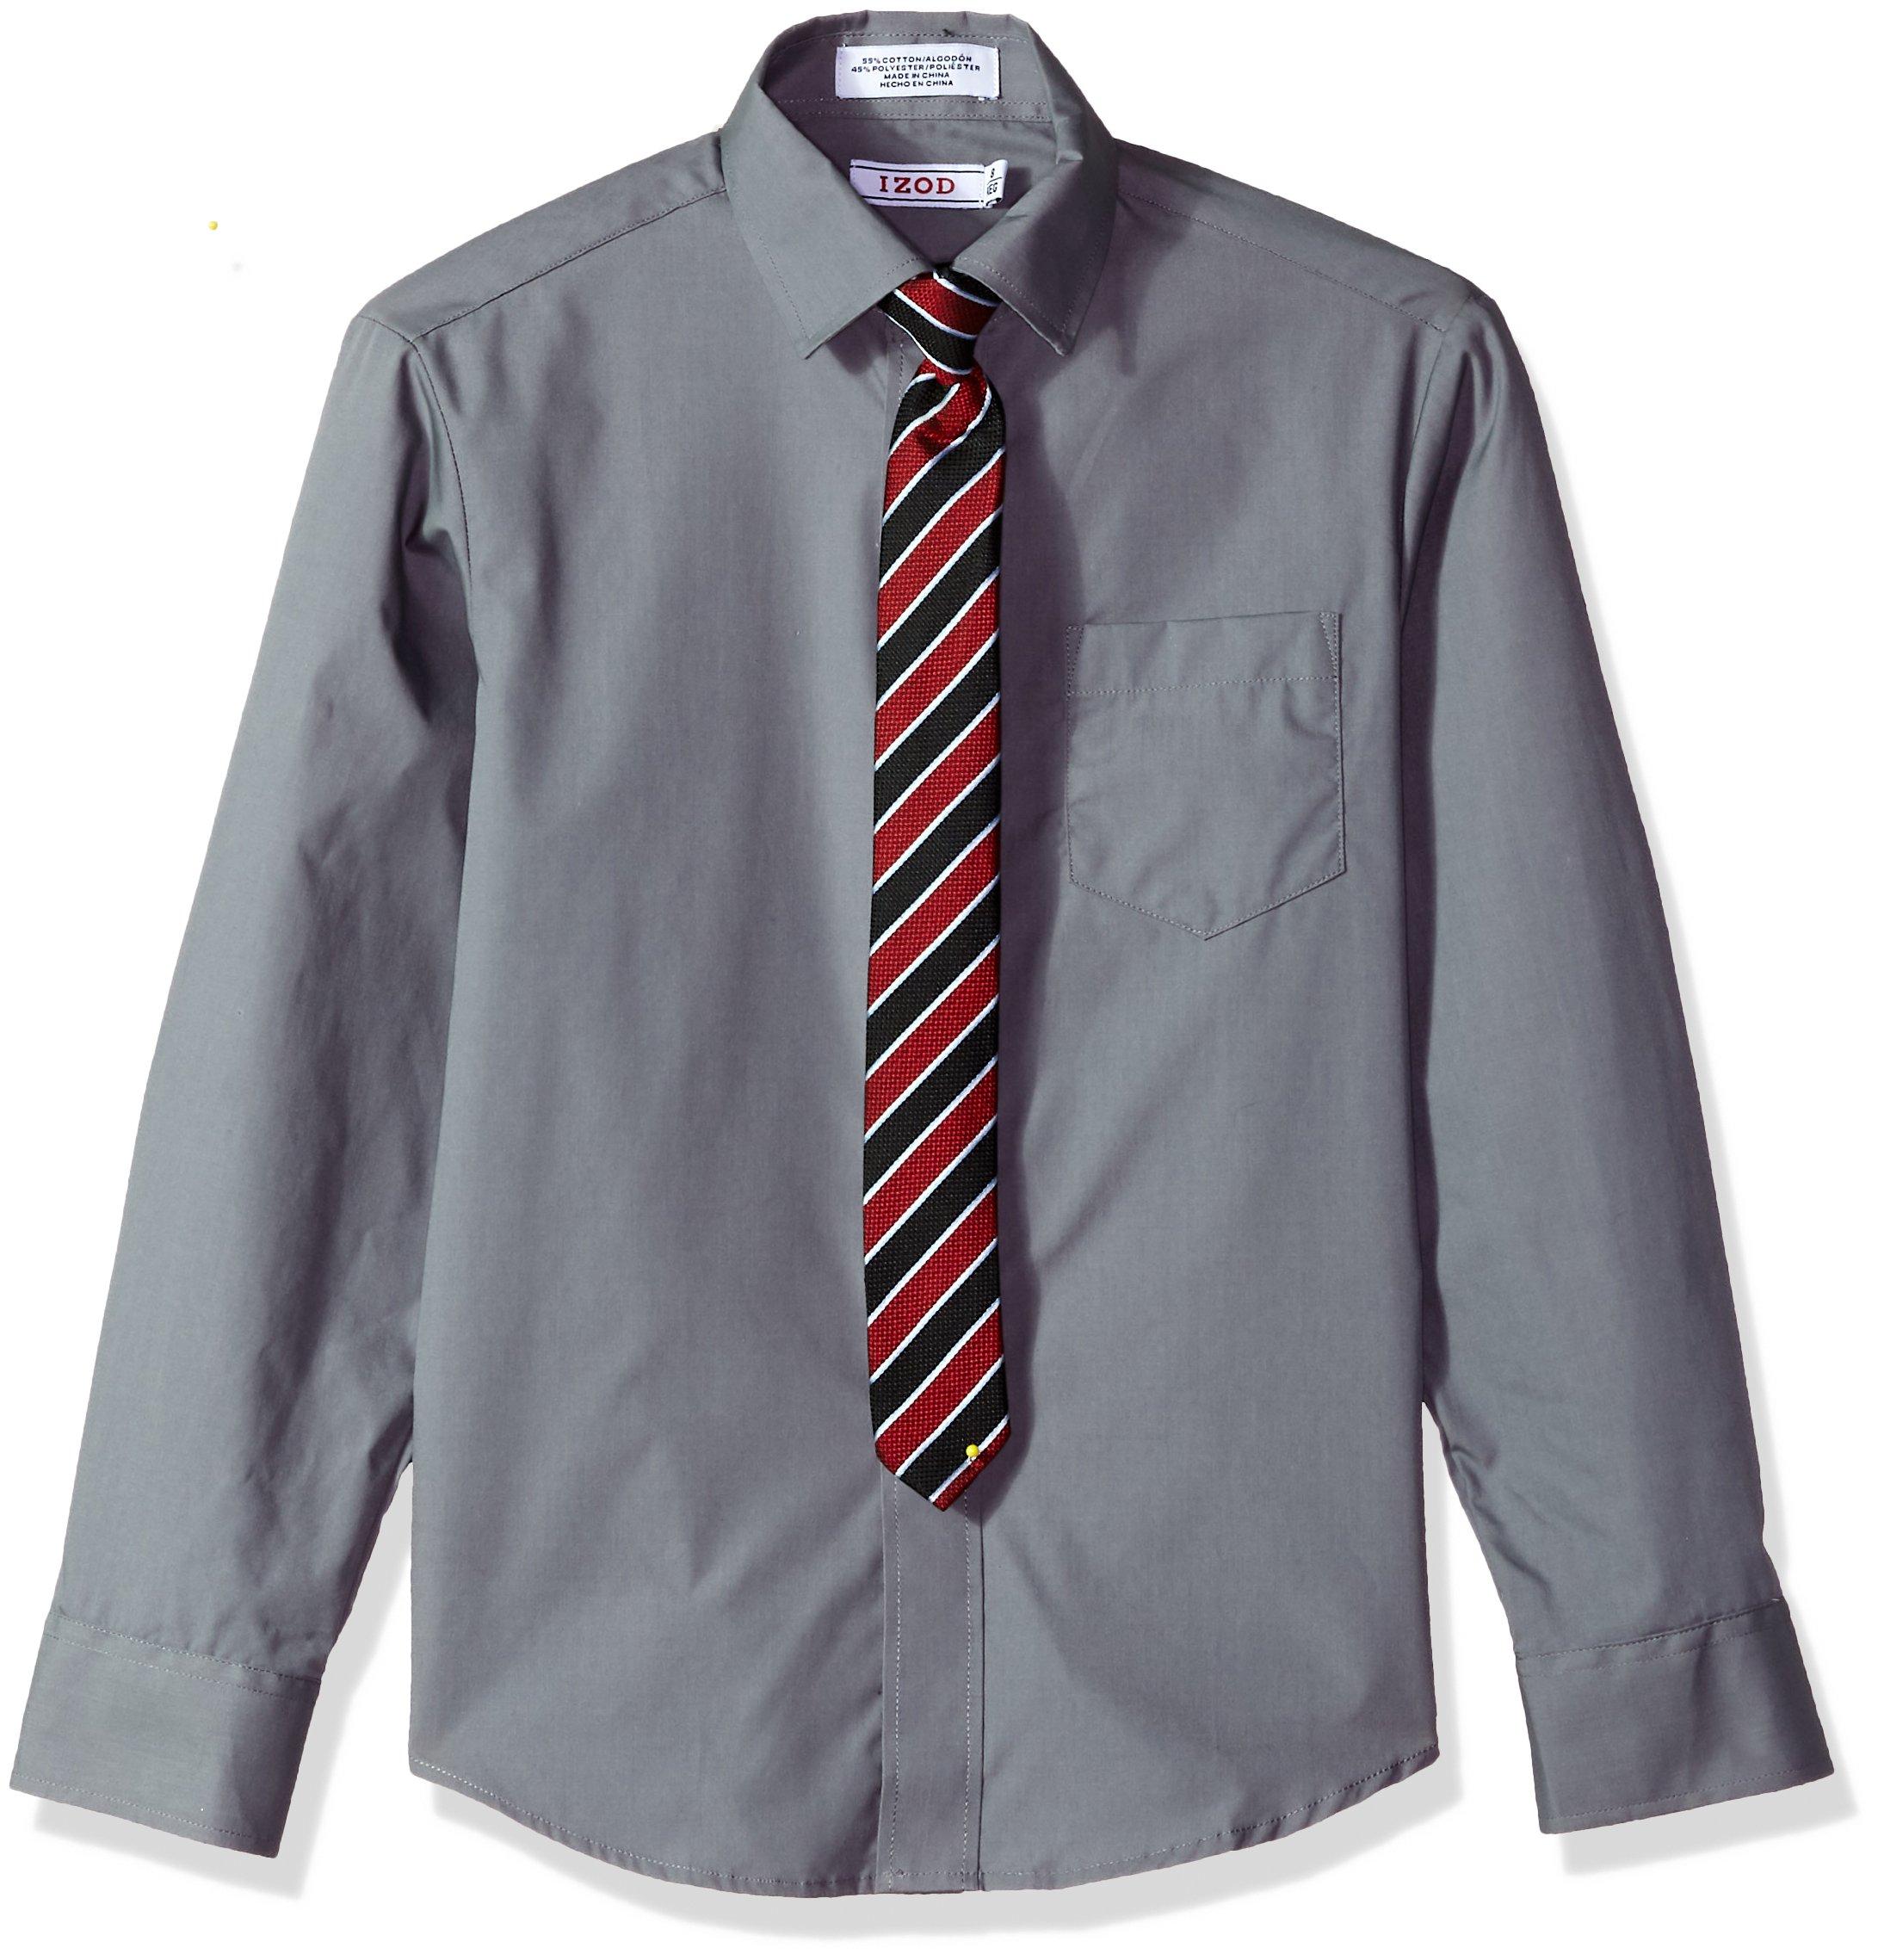 IZOD Big Boys' Dress Shirt and Tie Set, Silverware, 8